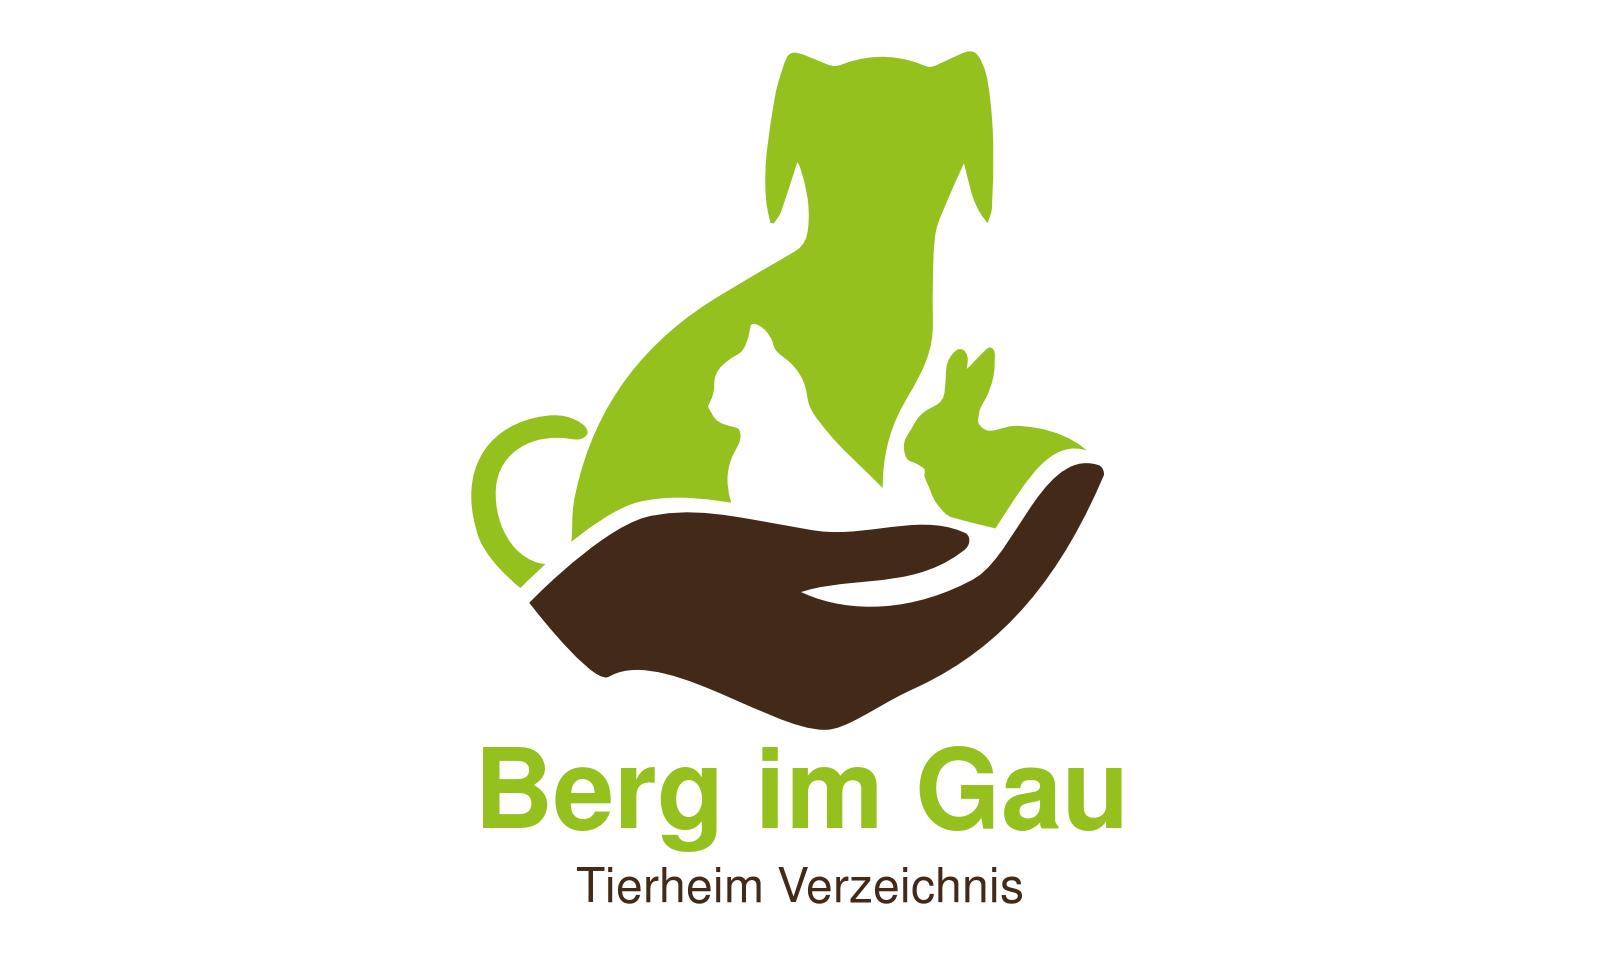 Tierheim Berg im Gau